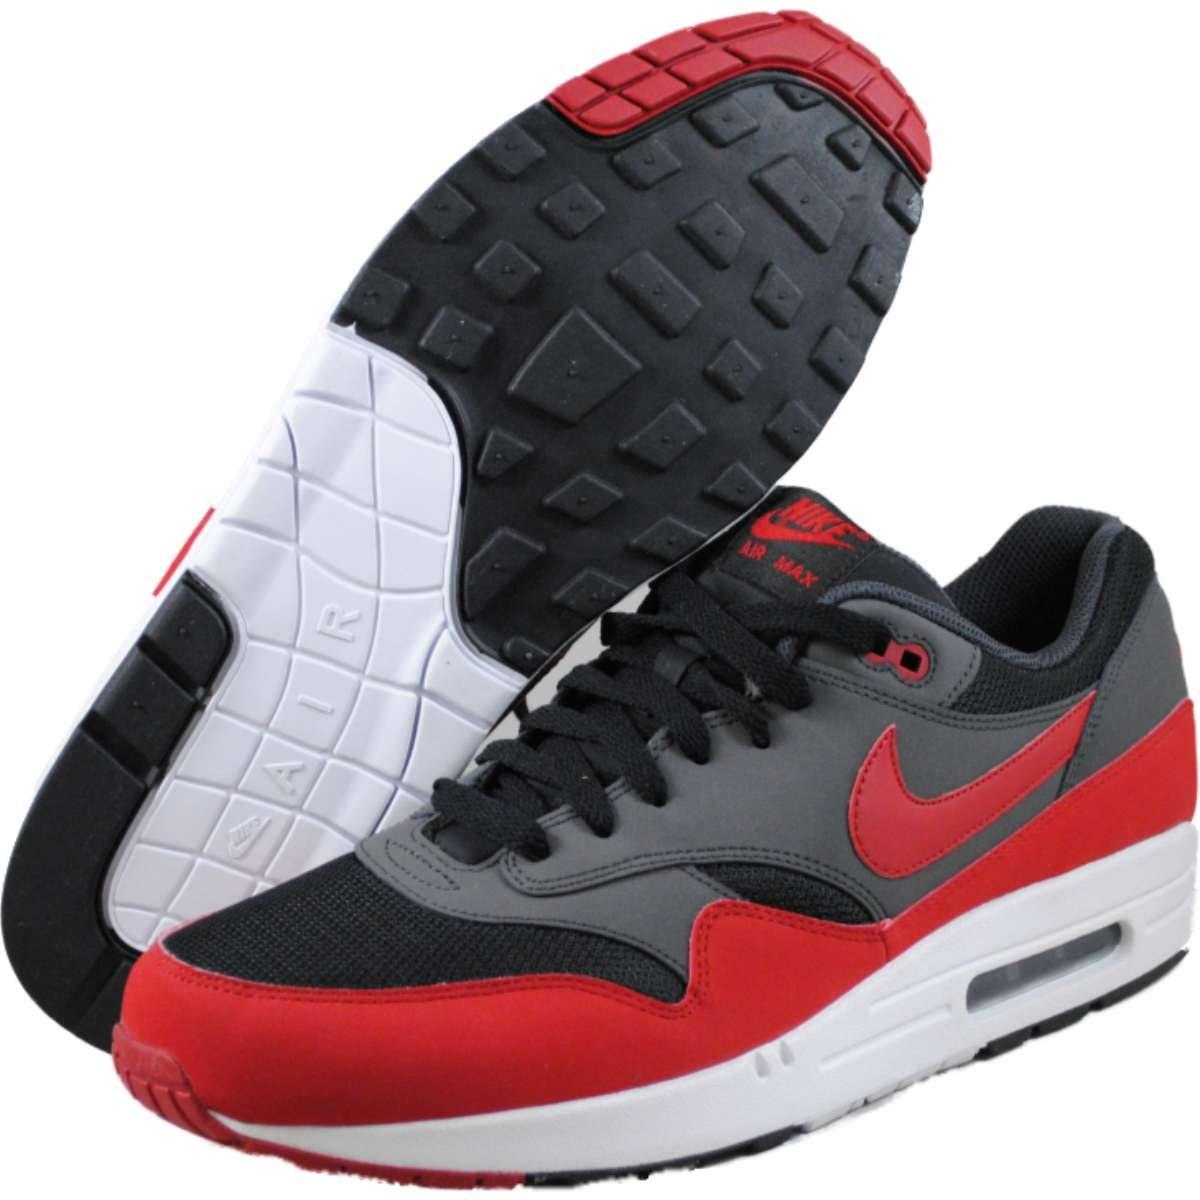 Nike Air Max 1 Essential 537383 Herren Laufschuhe  425 EU|BLACK/GYM RED/ANTHRACITE/WHITE